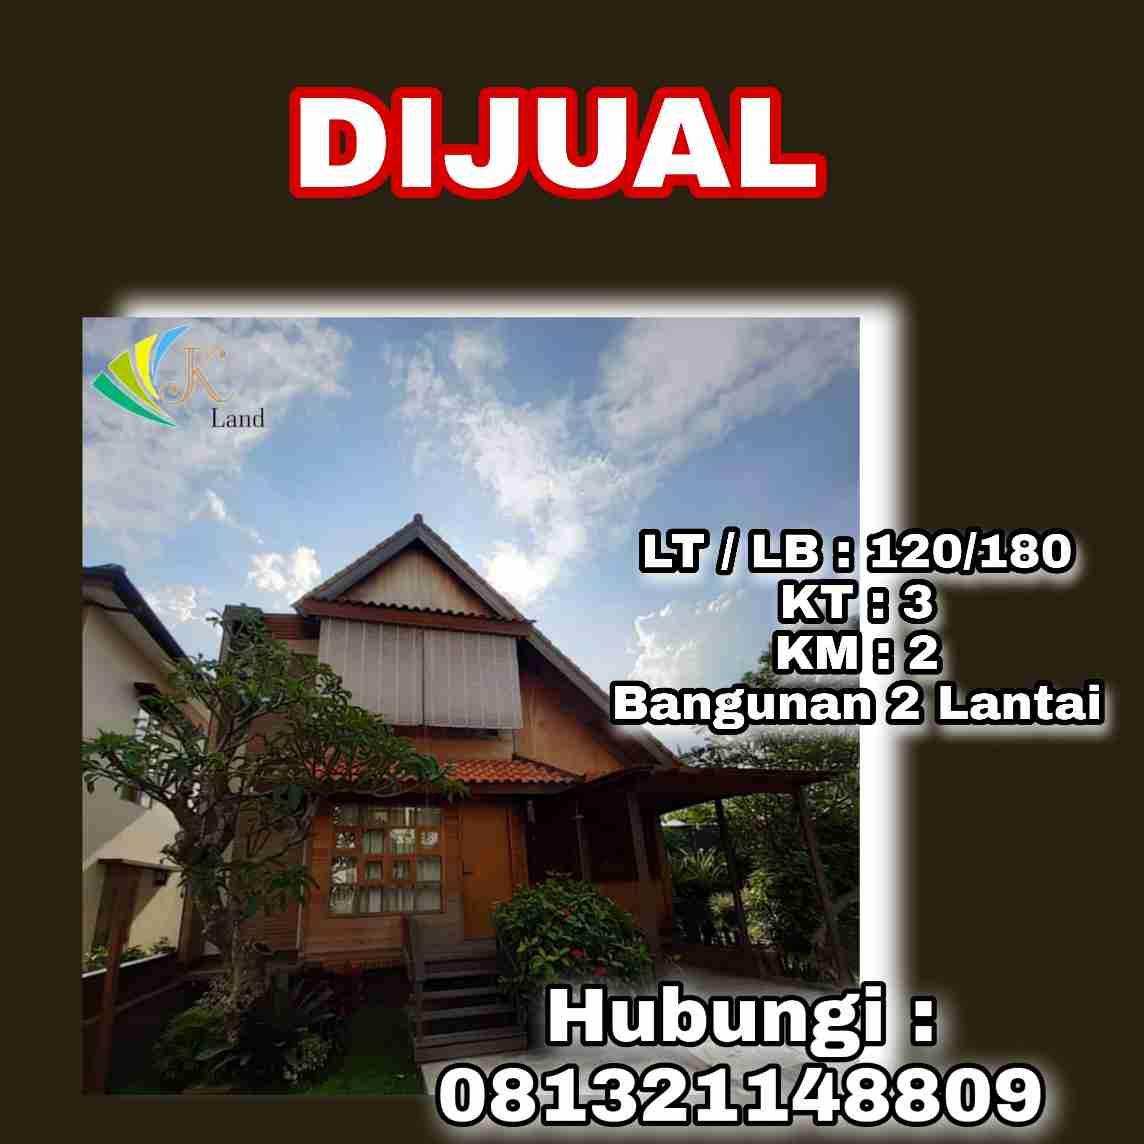 Dijual Villa (Rumah Kayu) Nyaman Bandung